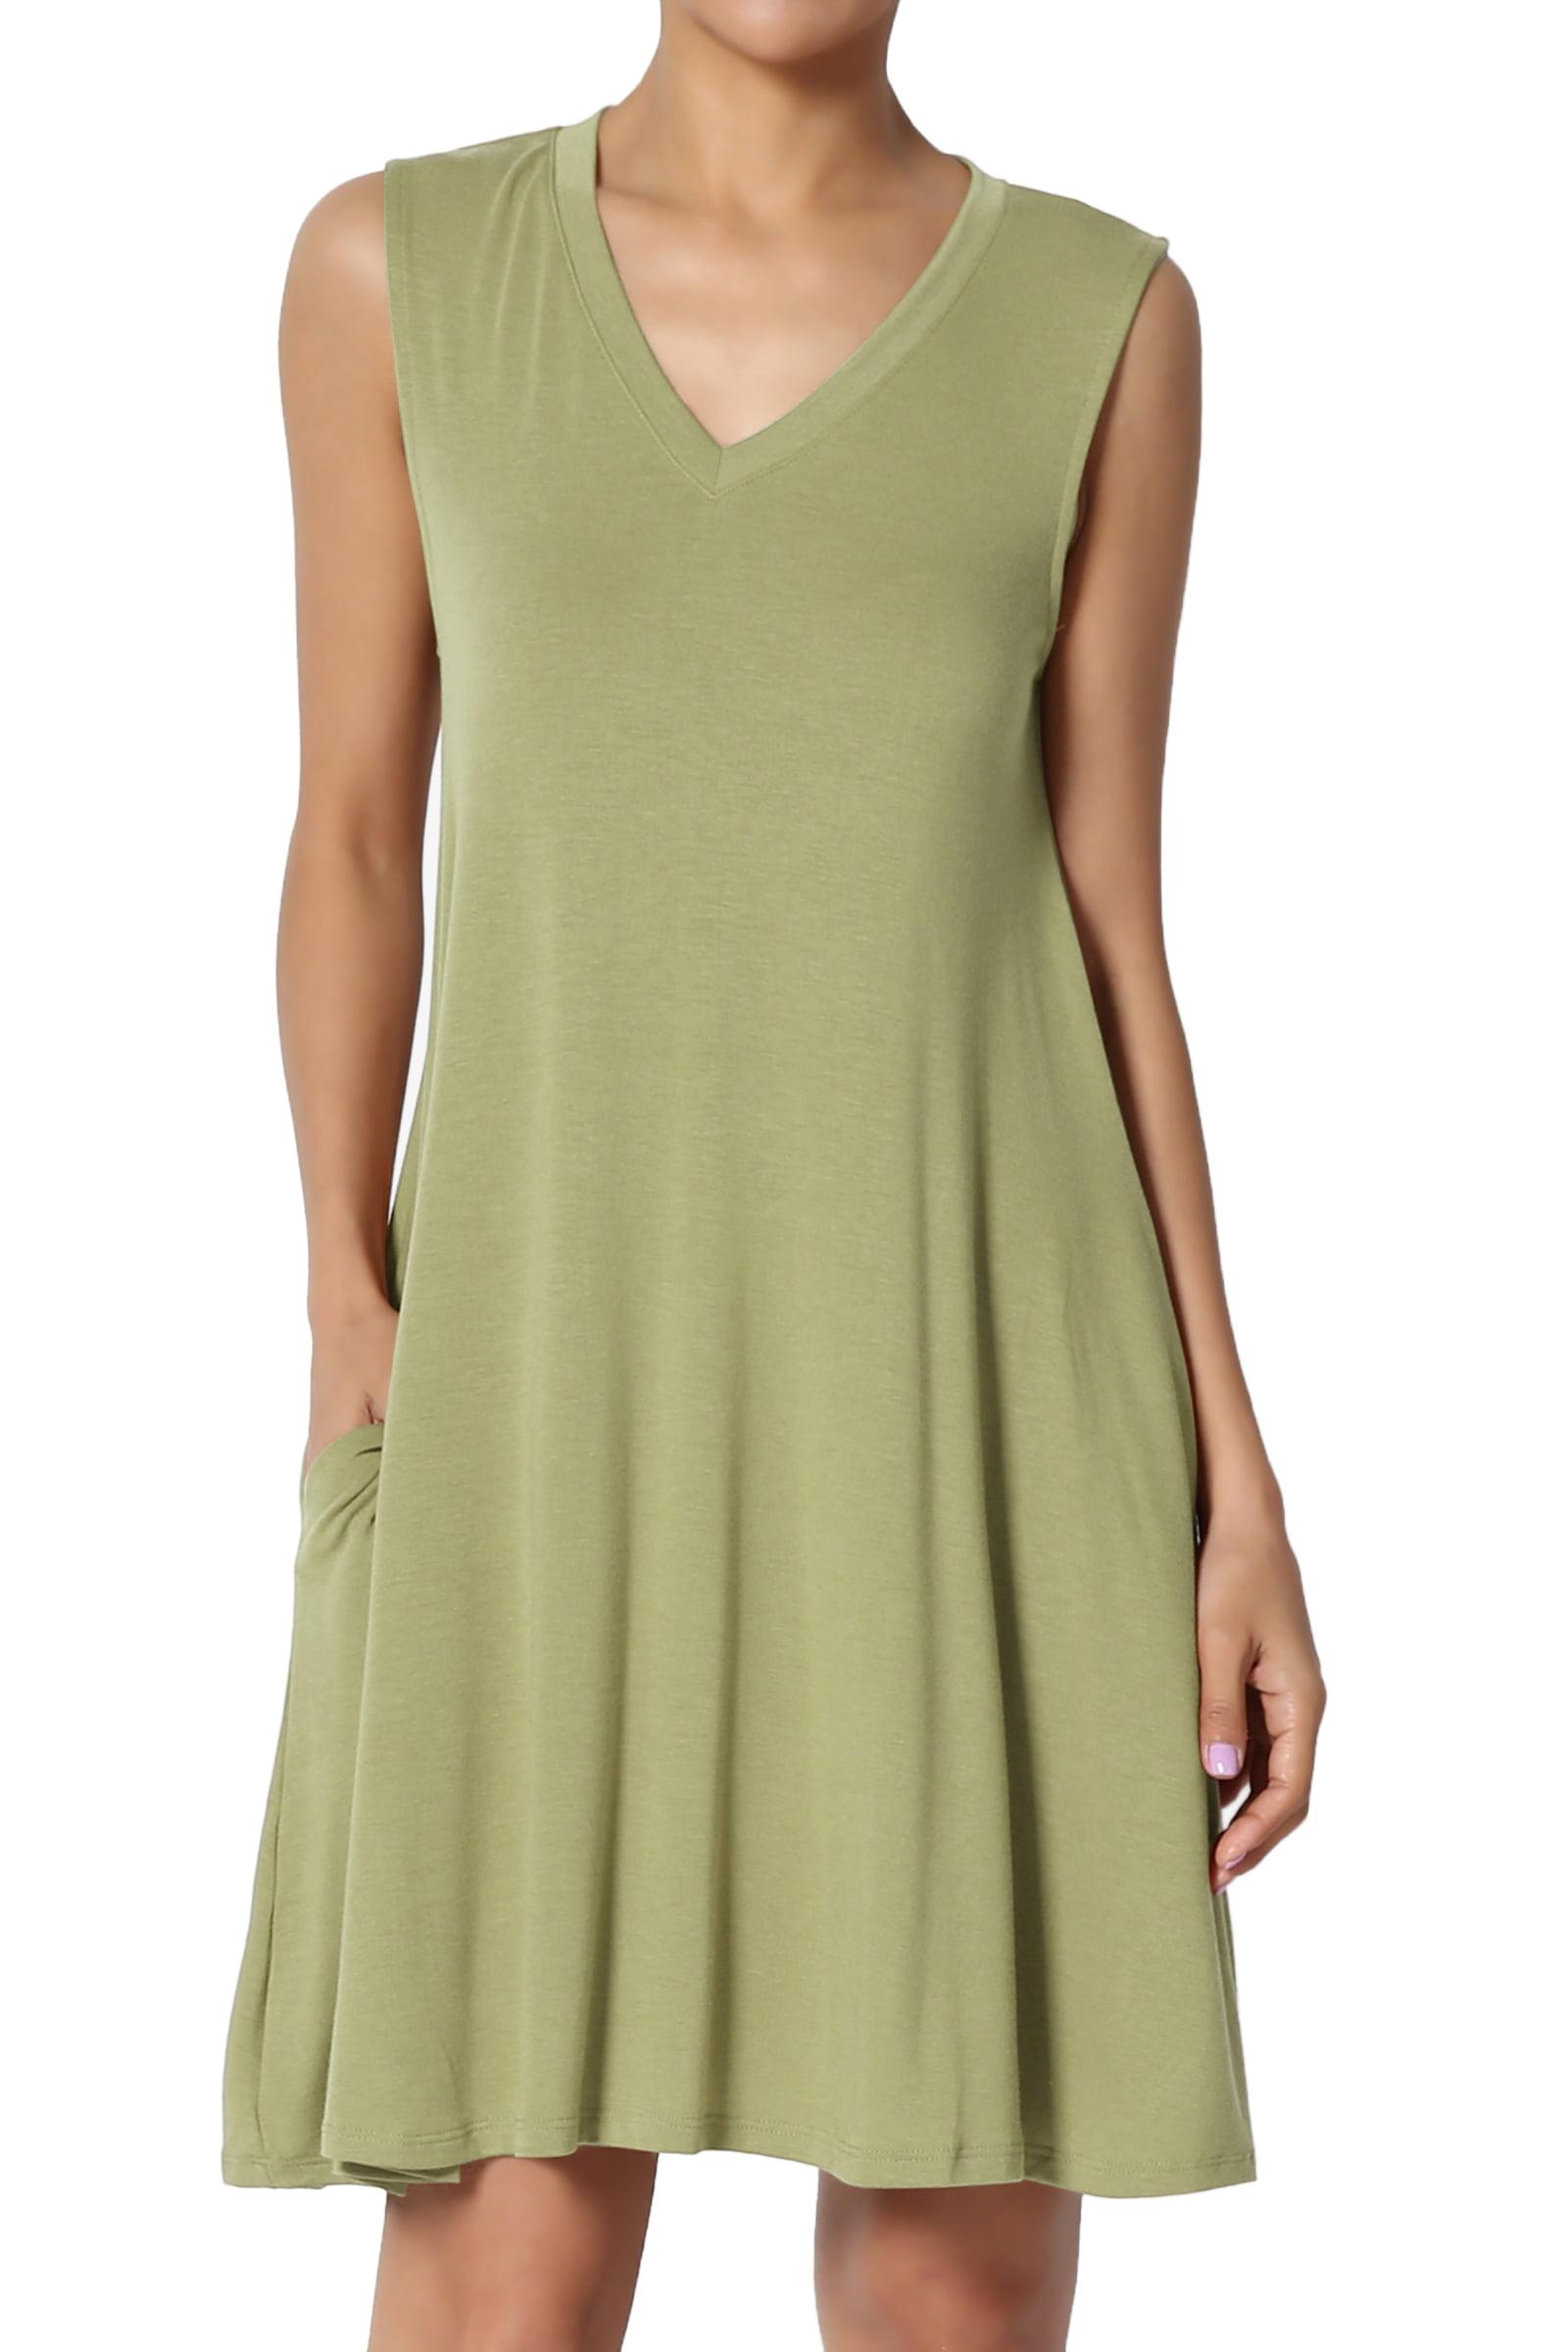 TheMogan Women's S~3X Sleeveless V-Neck Pocket Swing Flared Long Tank Top Mini Dress